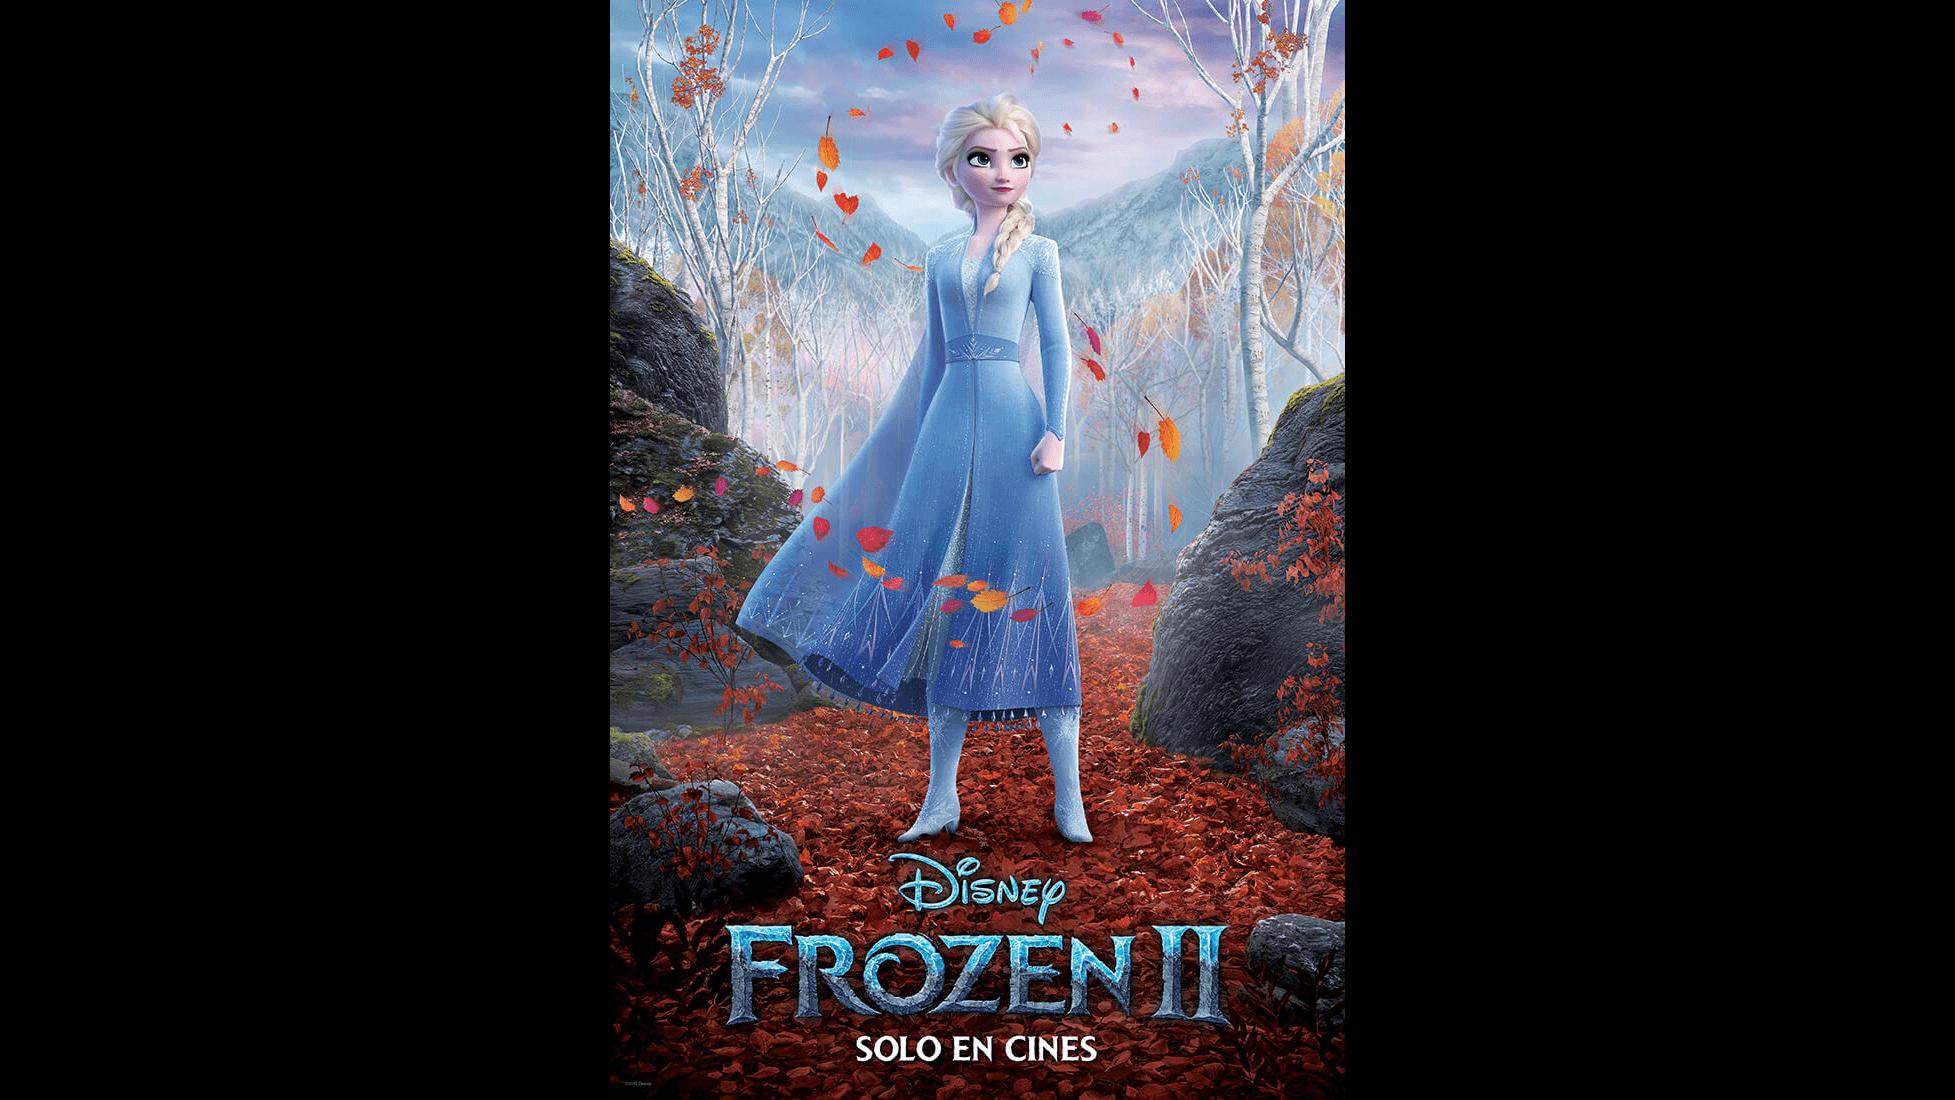 Frozen 2 - Póster Elsa